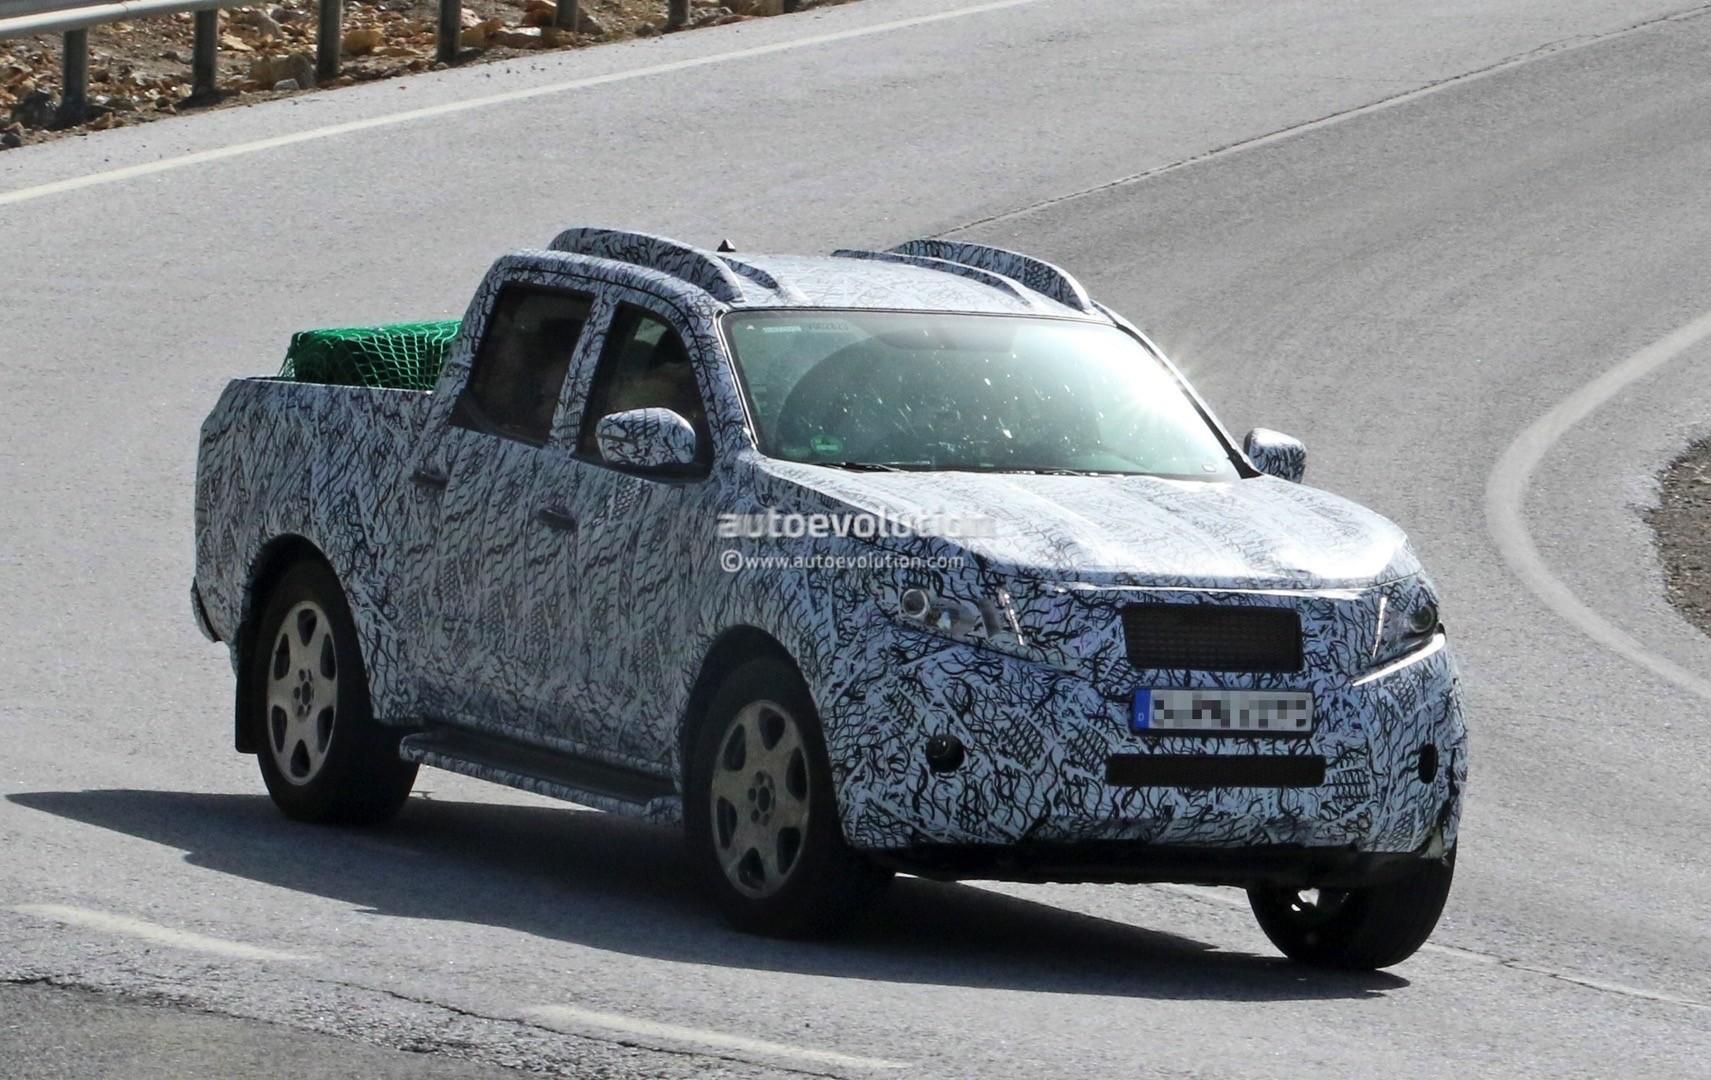 2017 Mercedes Benz Glt Pickup Truck Test Mule